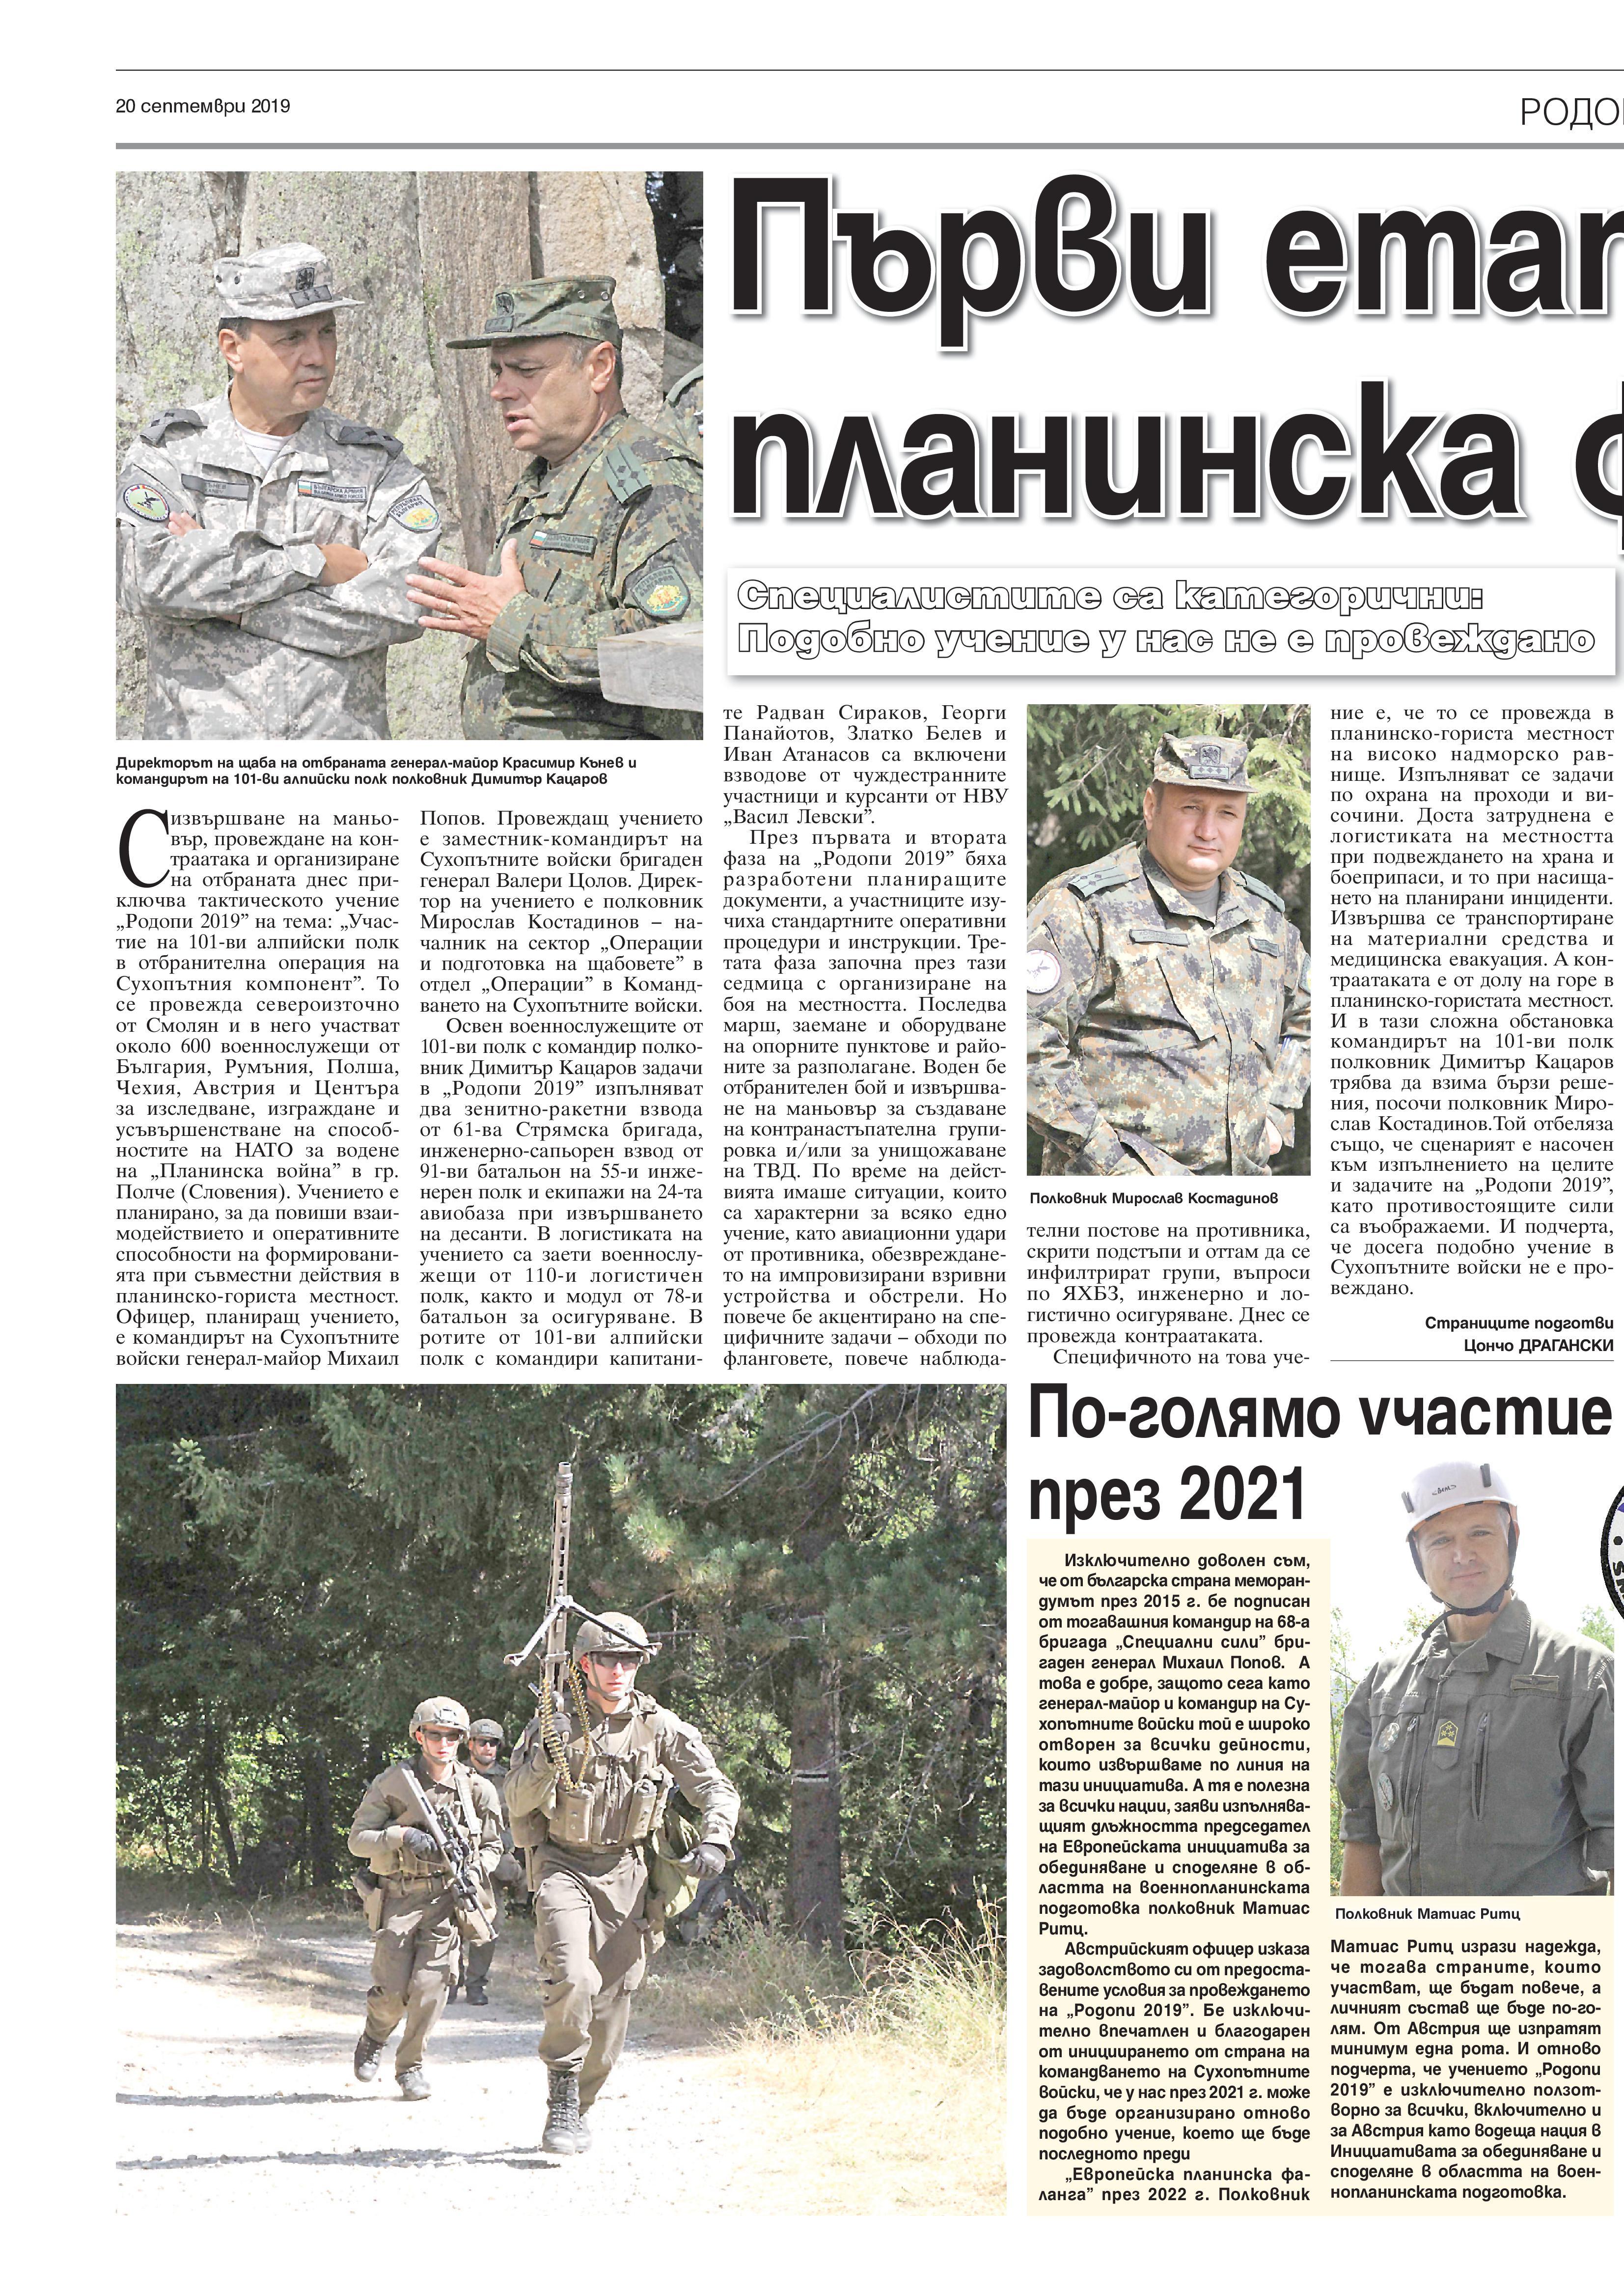 https://armymedia.bg/wp-content/uploads/2015/06/16-32.jpg